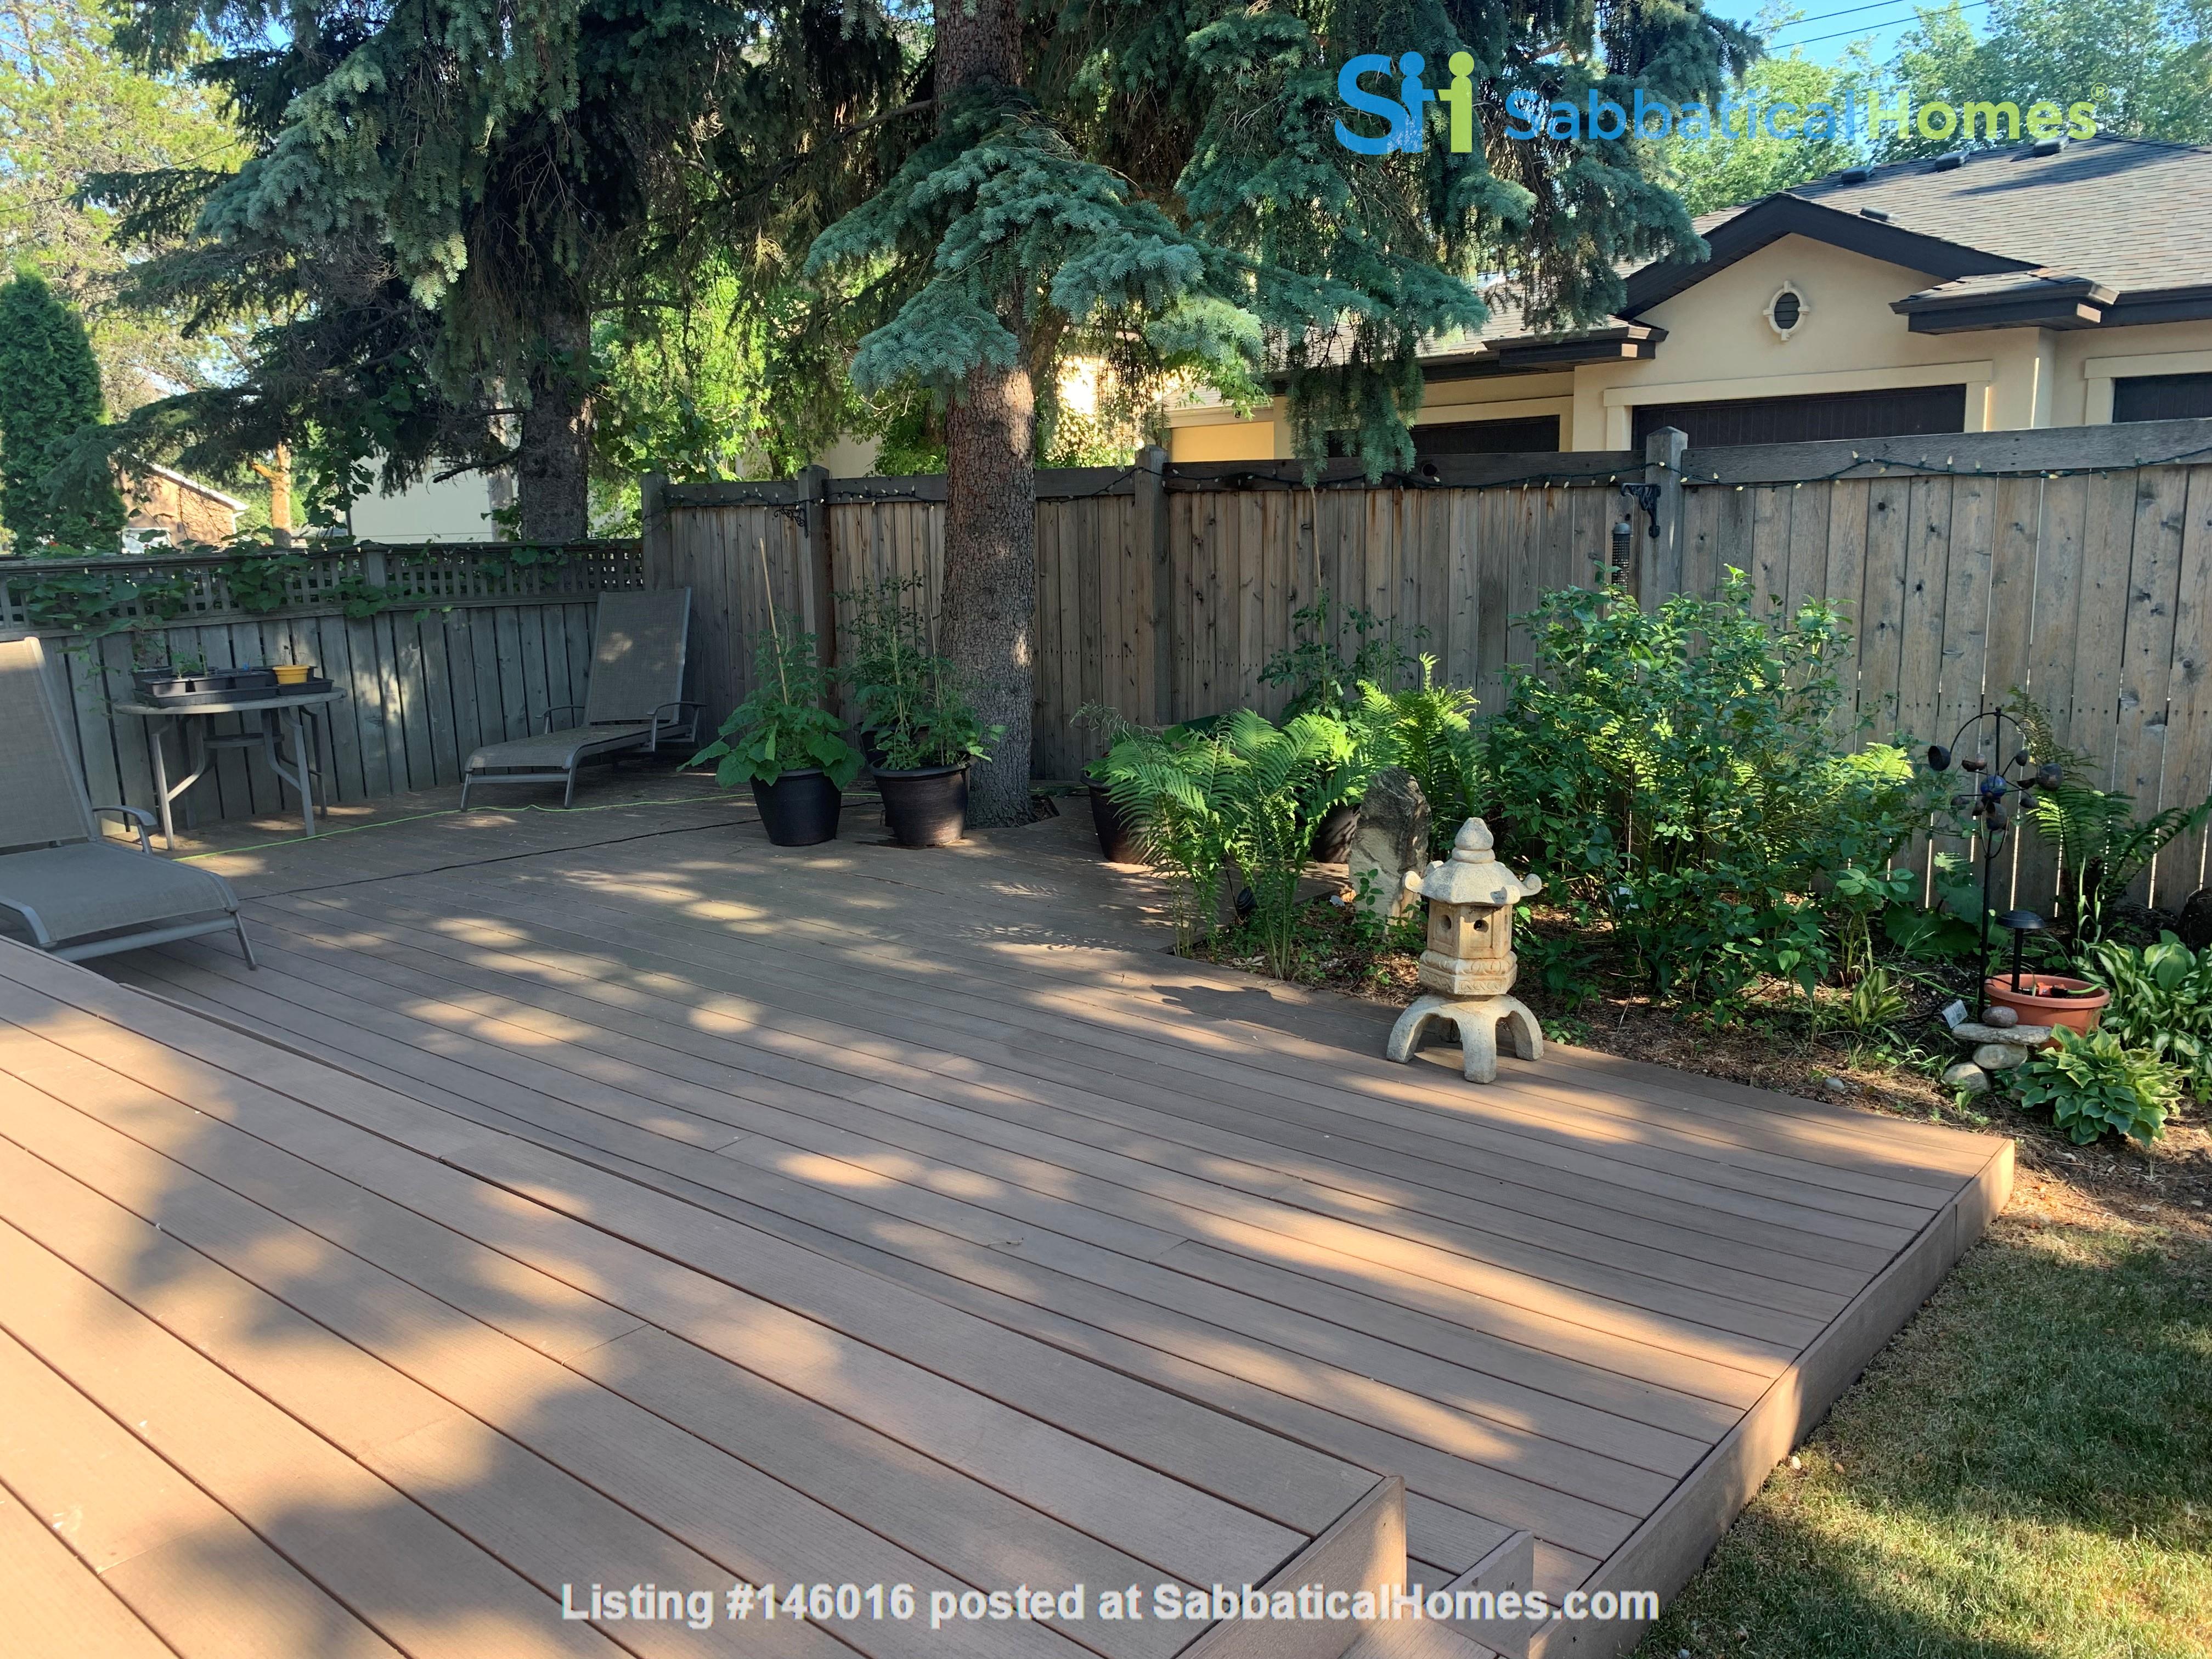 Forest haven sabbatical home Home Rental in Edmonton 3